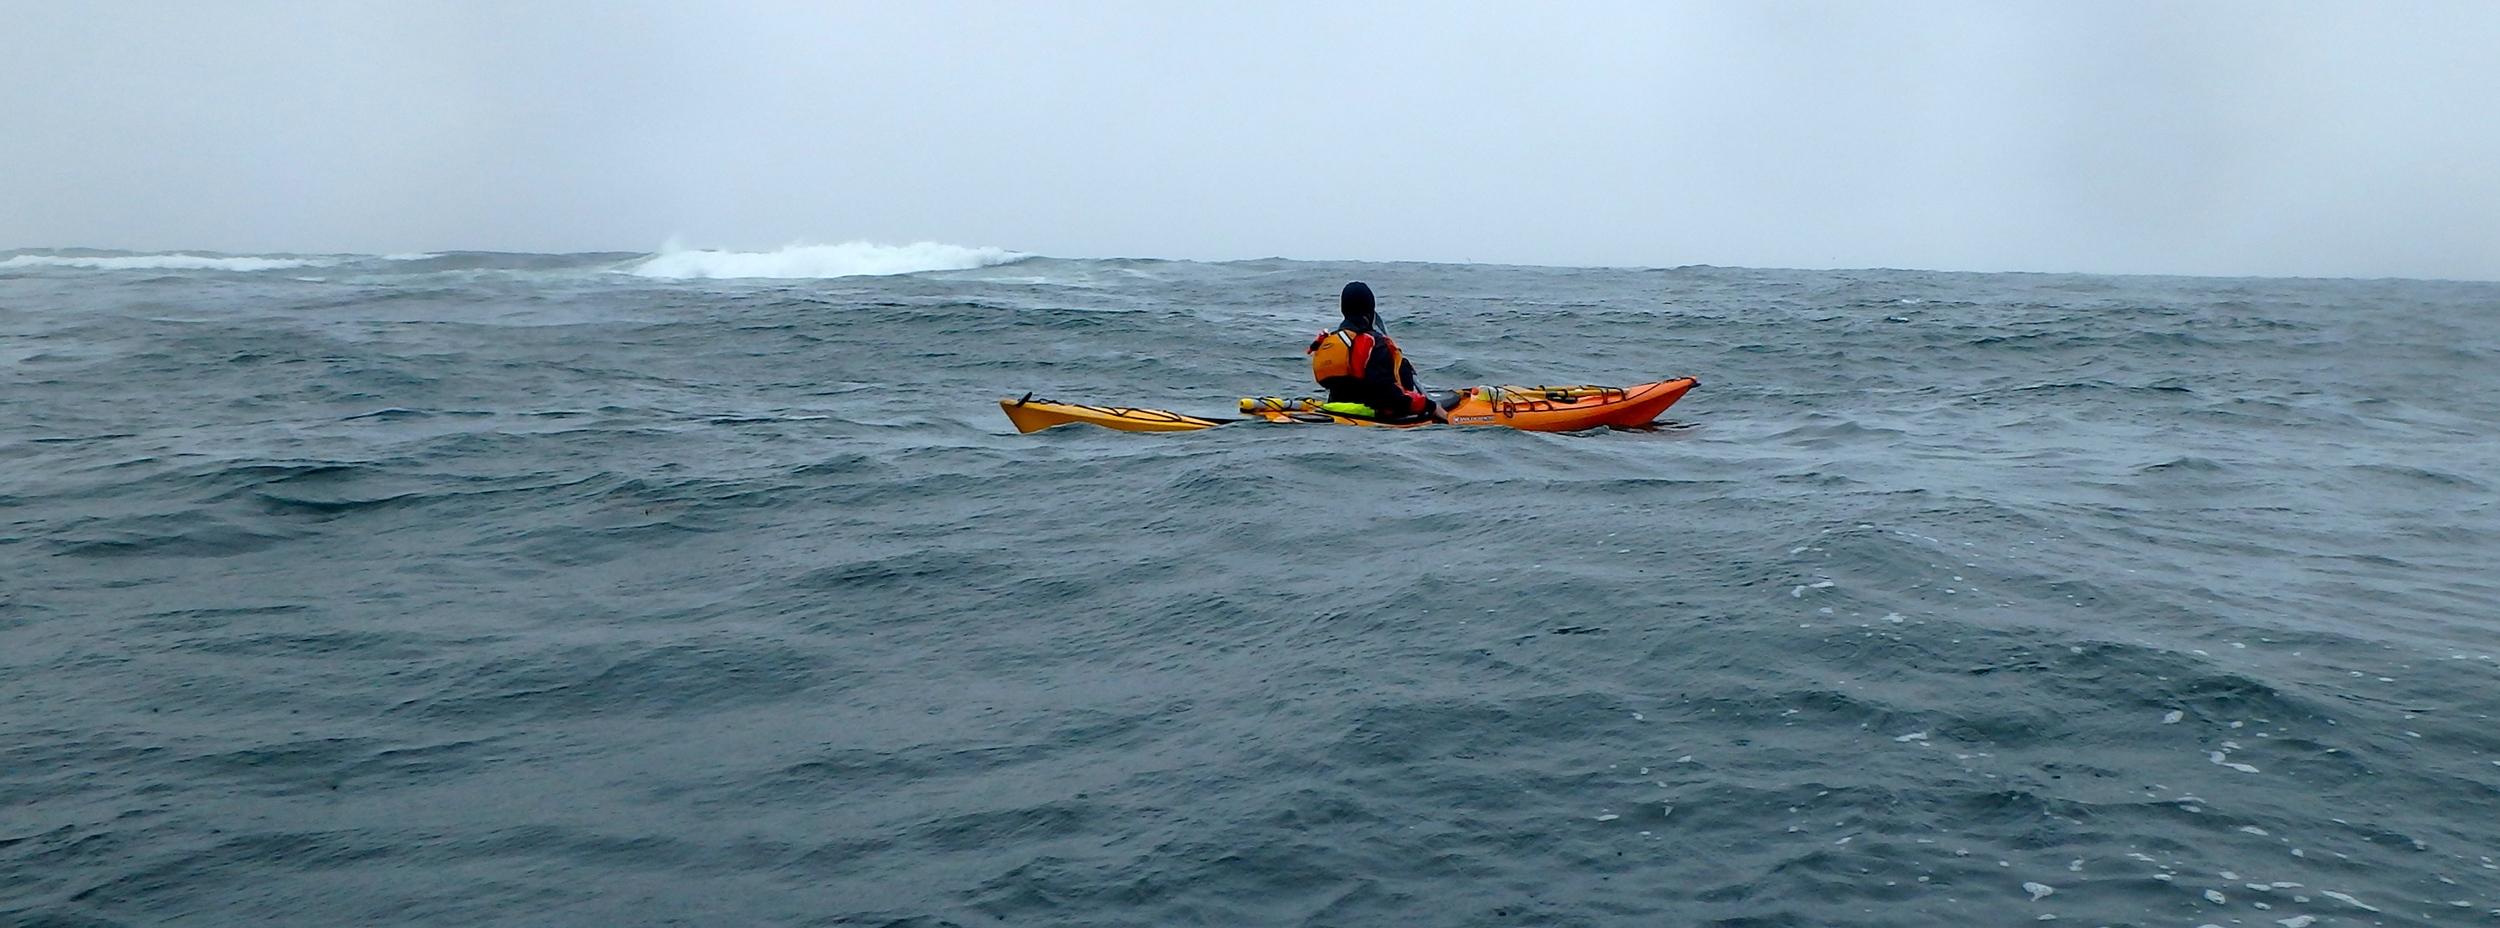 Swell breaks over McKenney Point, Photo: Joe Guglielmetti